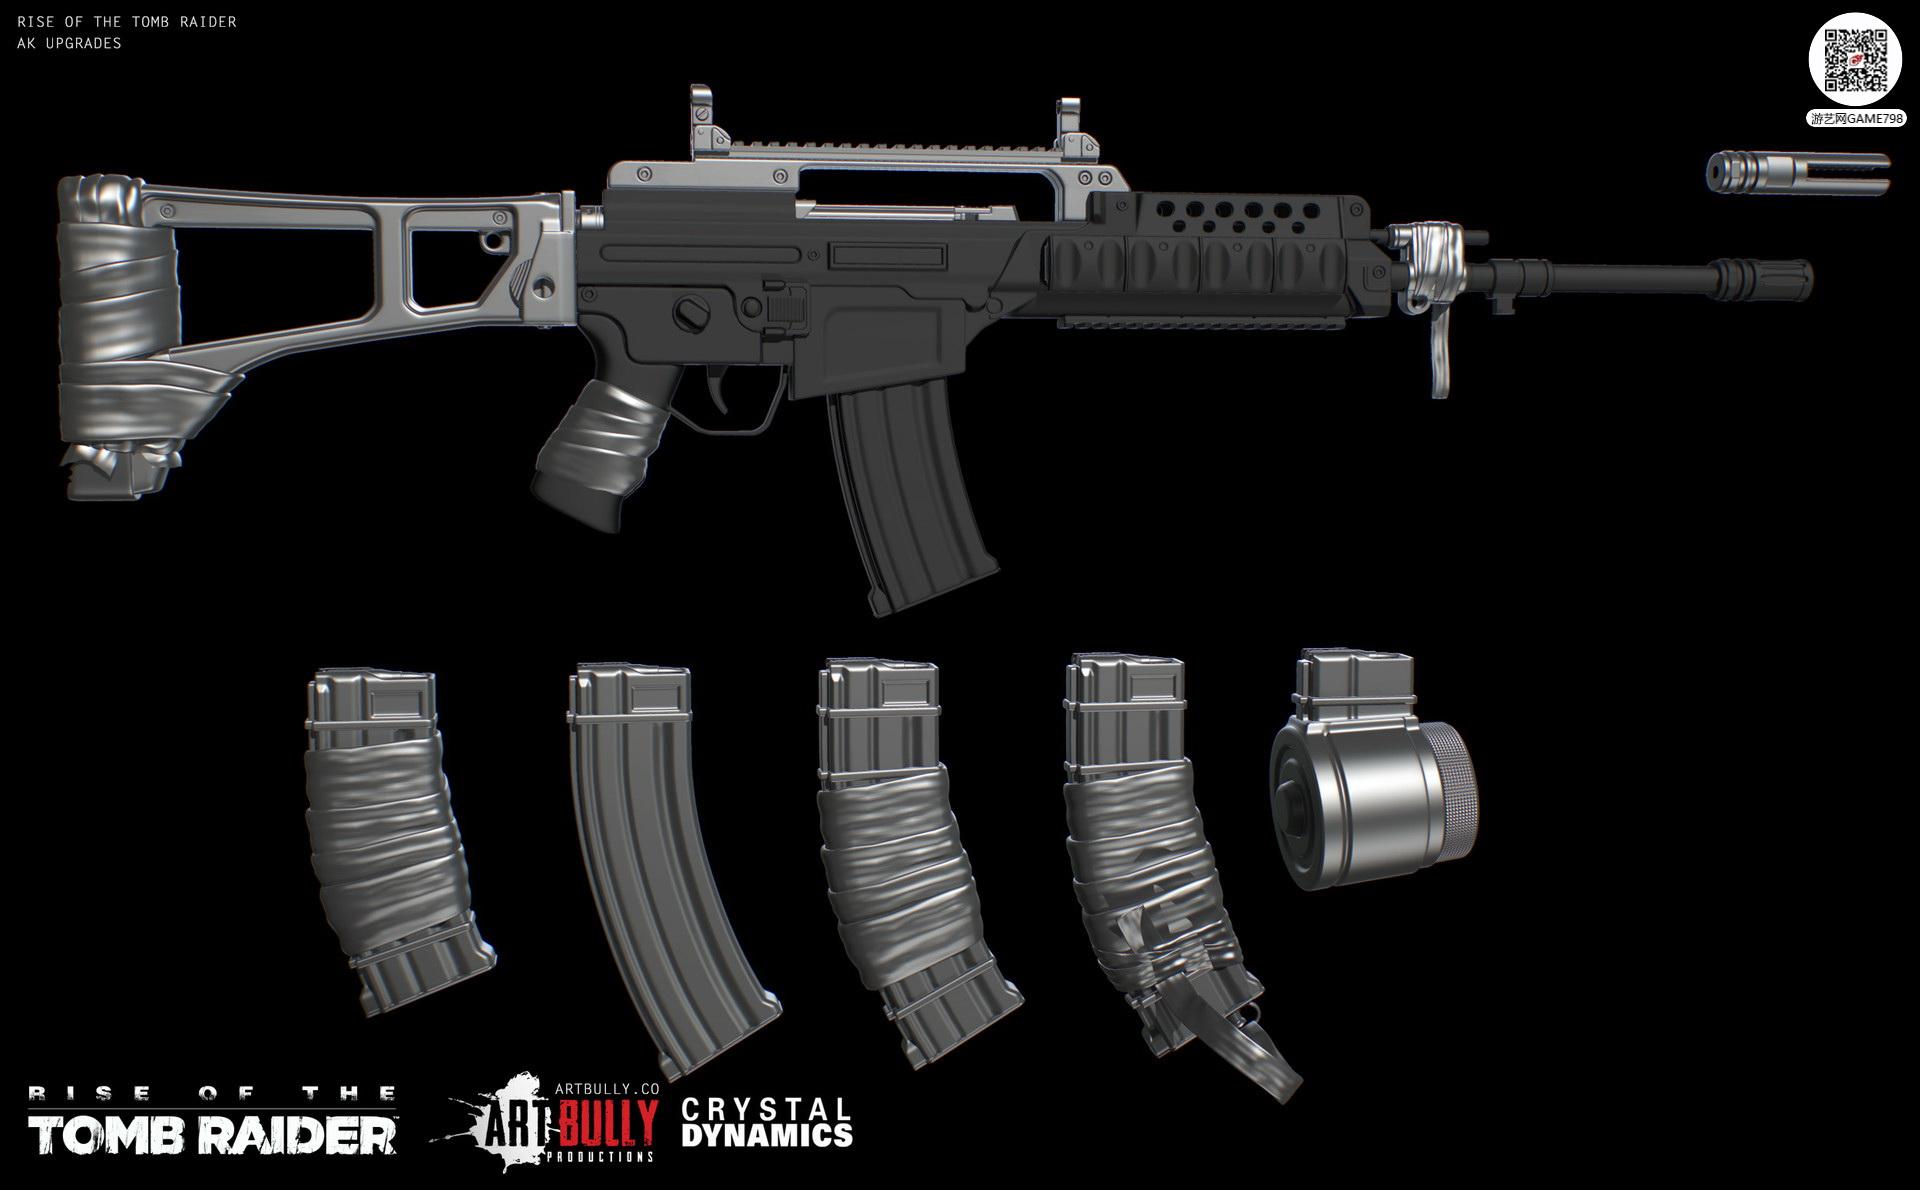 3A大作古墓丽影:崛起枪支次世代3D模型下载